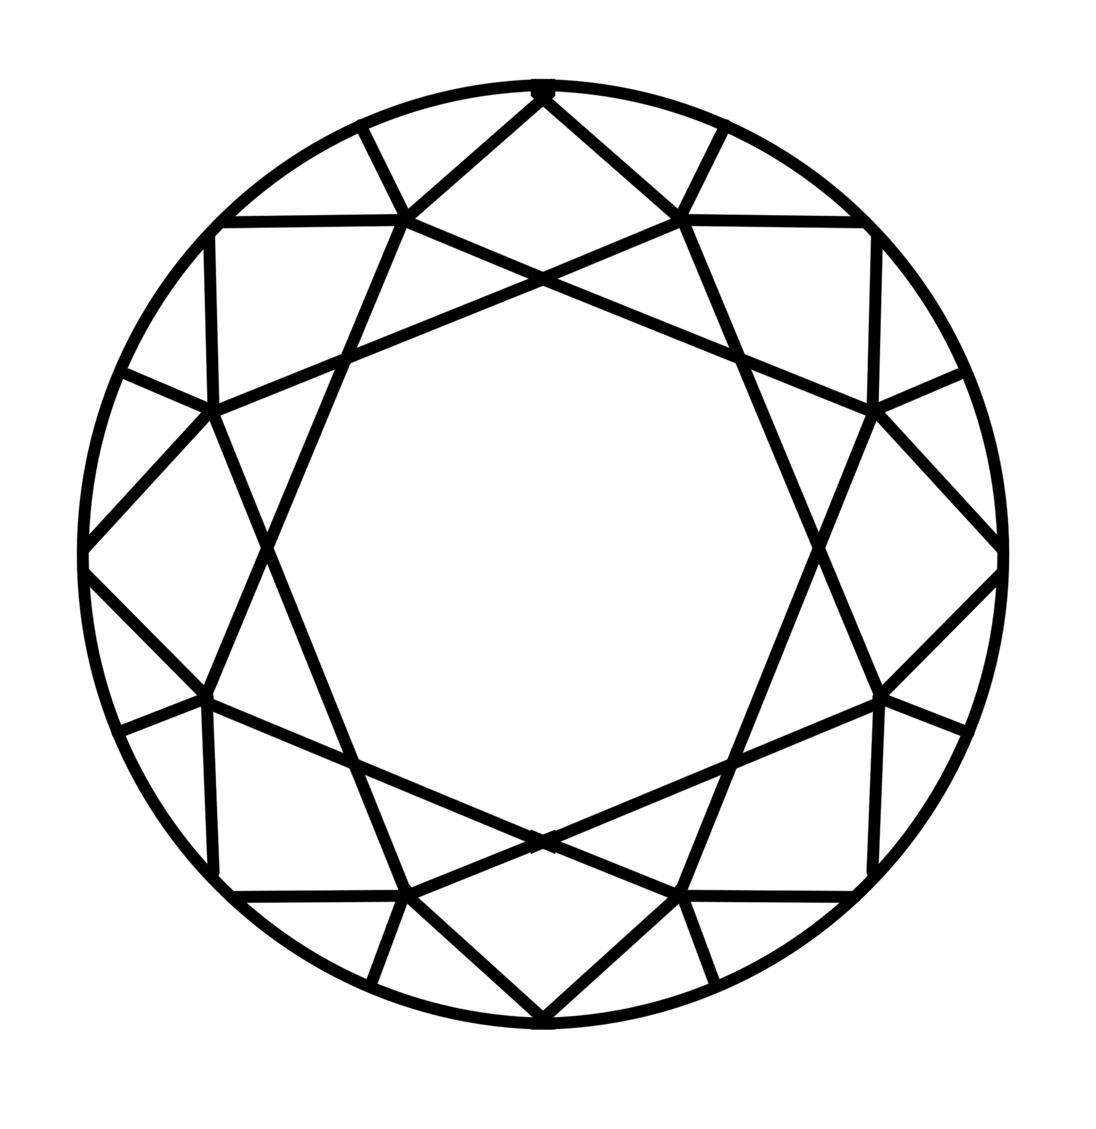 Diamond Outline Vector - ClipArt Best